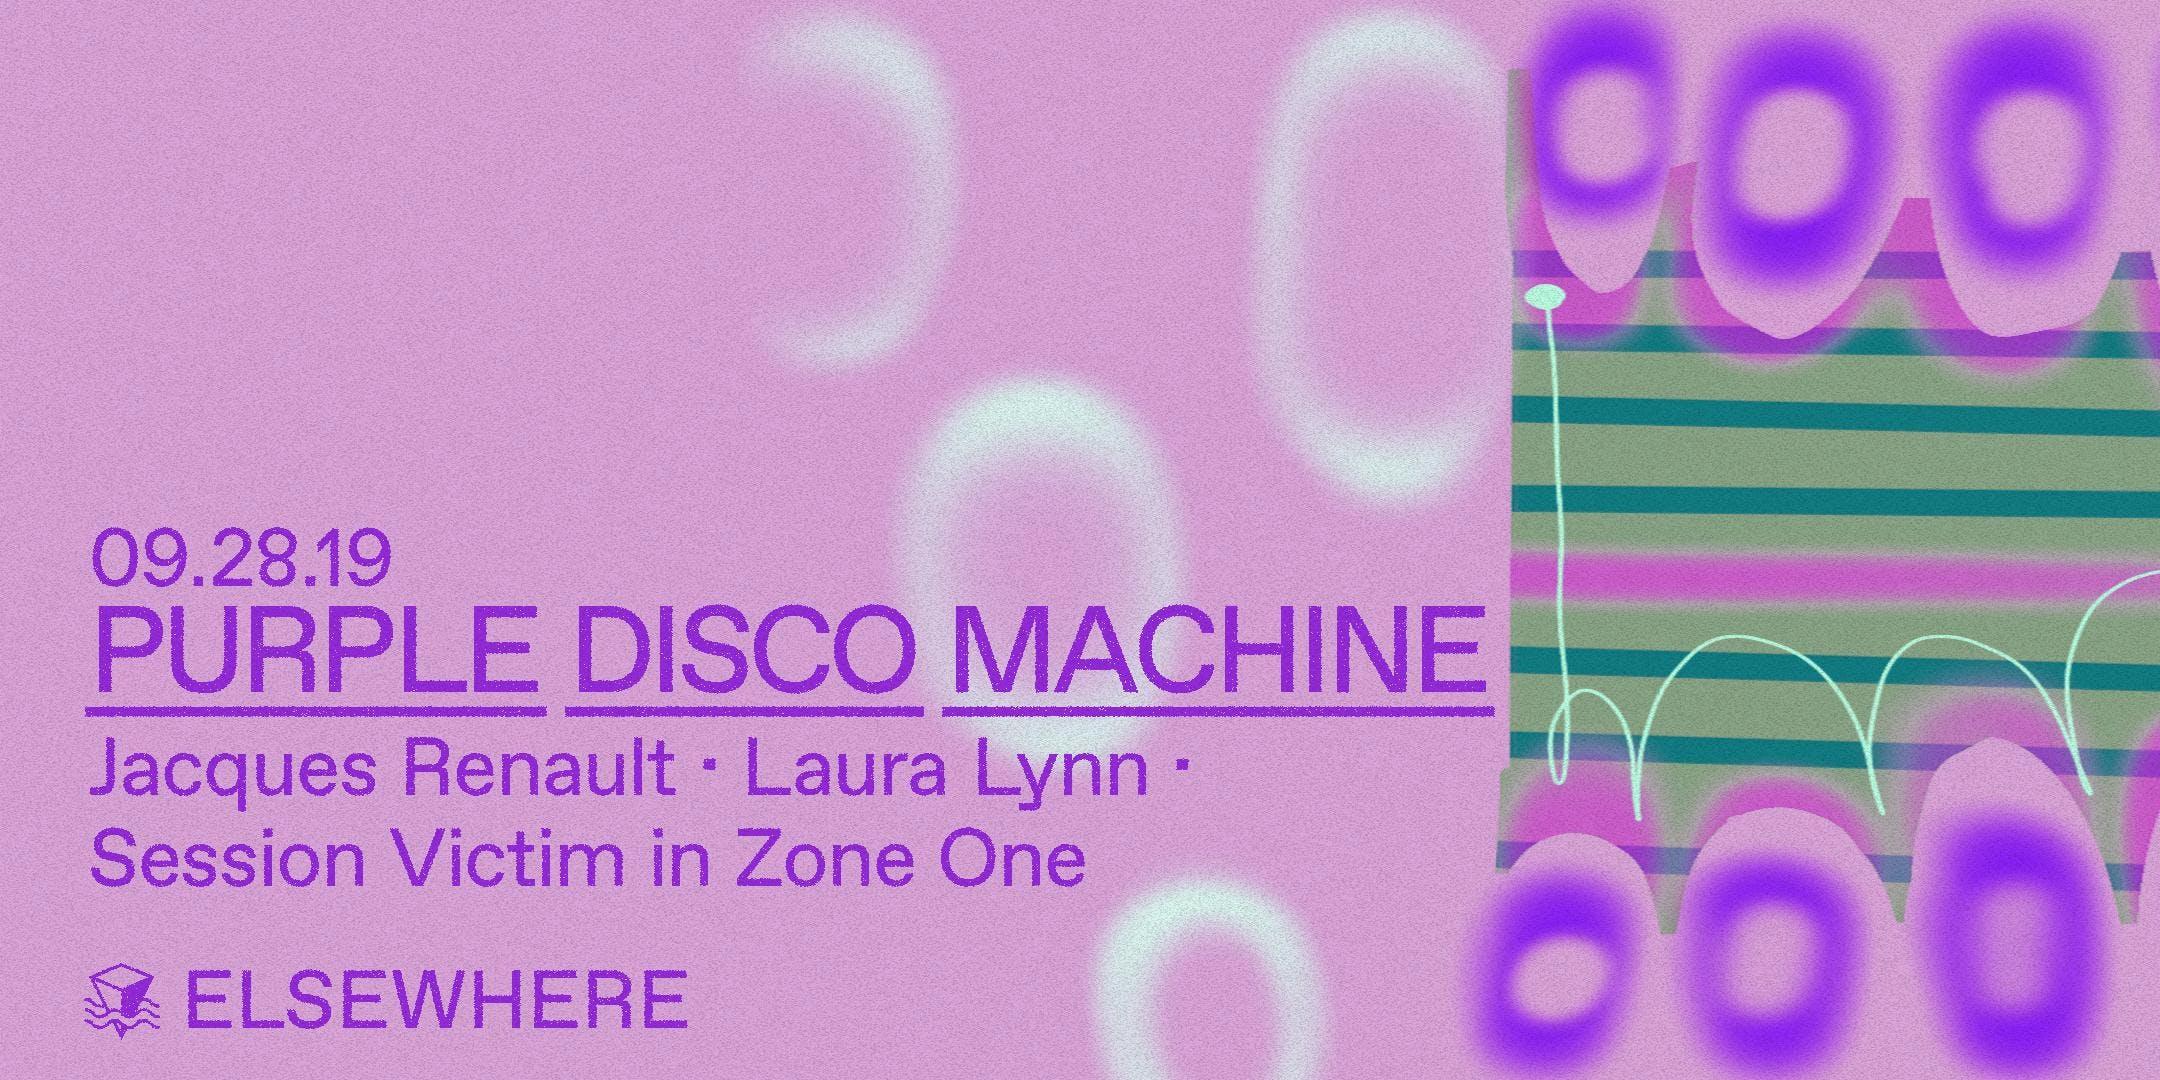 Purple Disco Machine, Jacques Renault, Laura Lynn & Session Victim